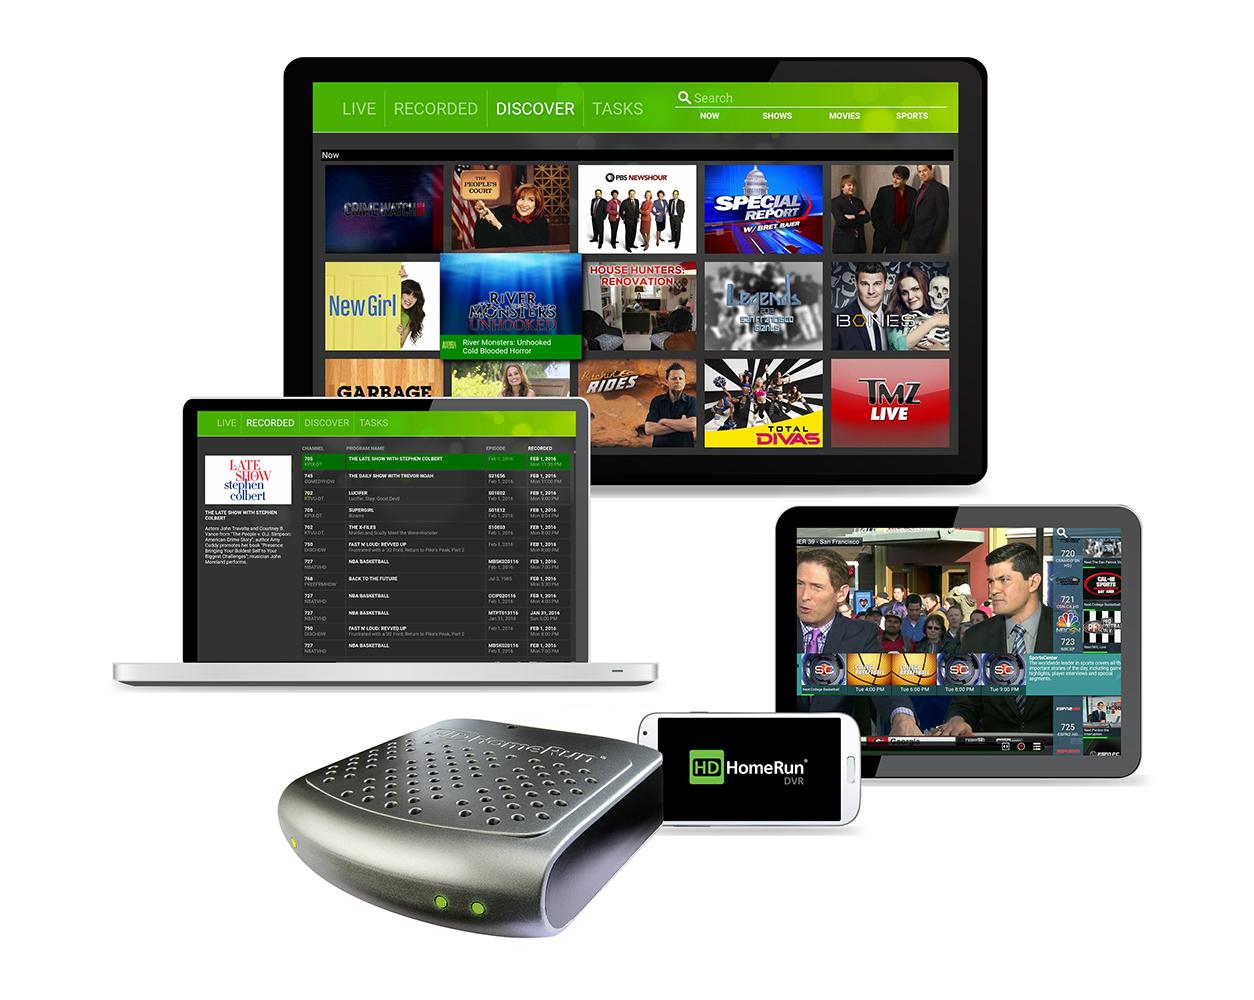 HDHomeRun - CONNECT DUAL OTA DVR - Gray and Black $74.99